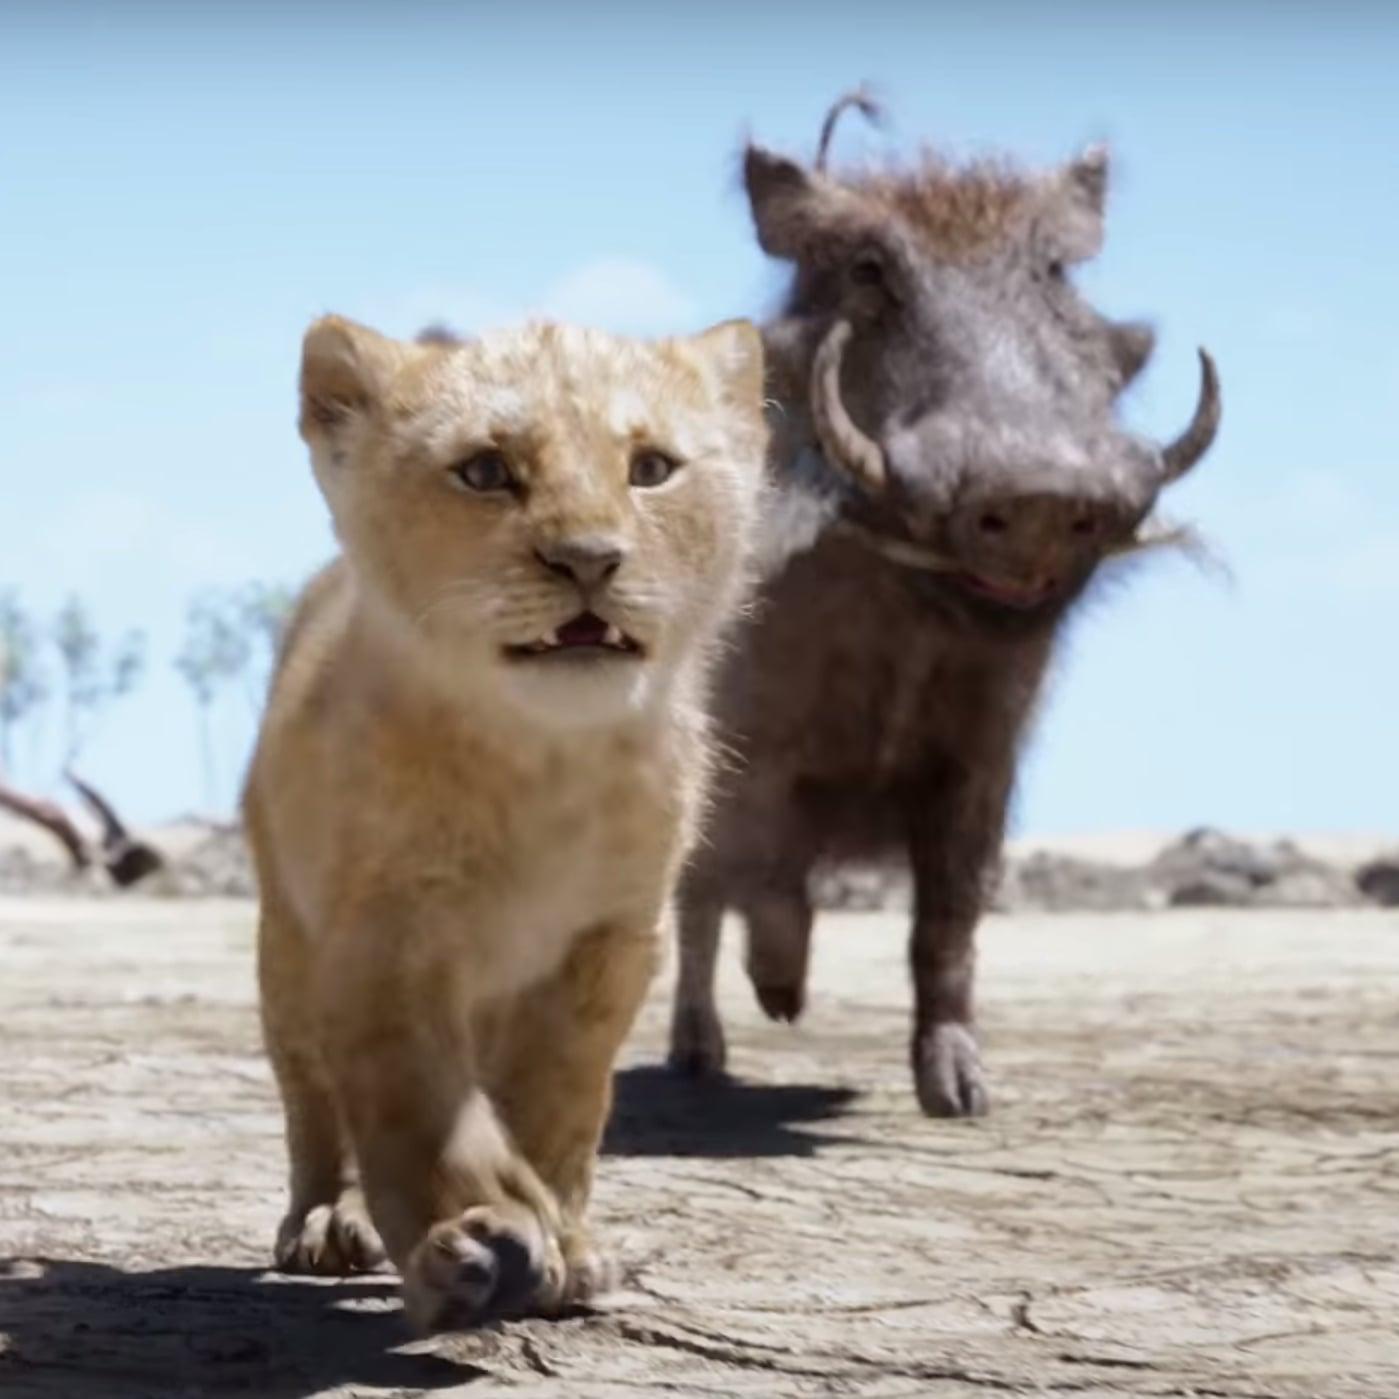 The Lion King Cast Singing Hakuna Matata Video 2019 Popsugar Entertainment